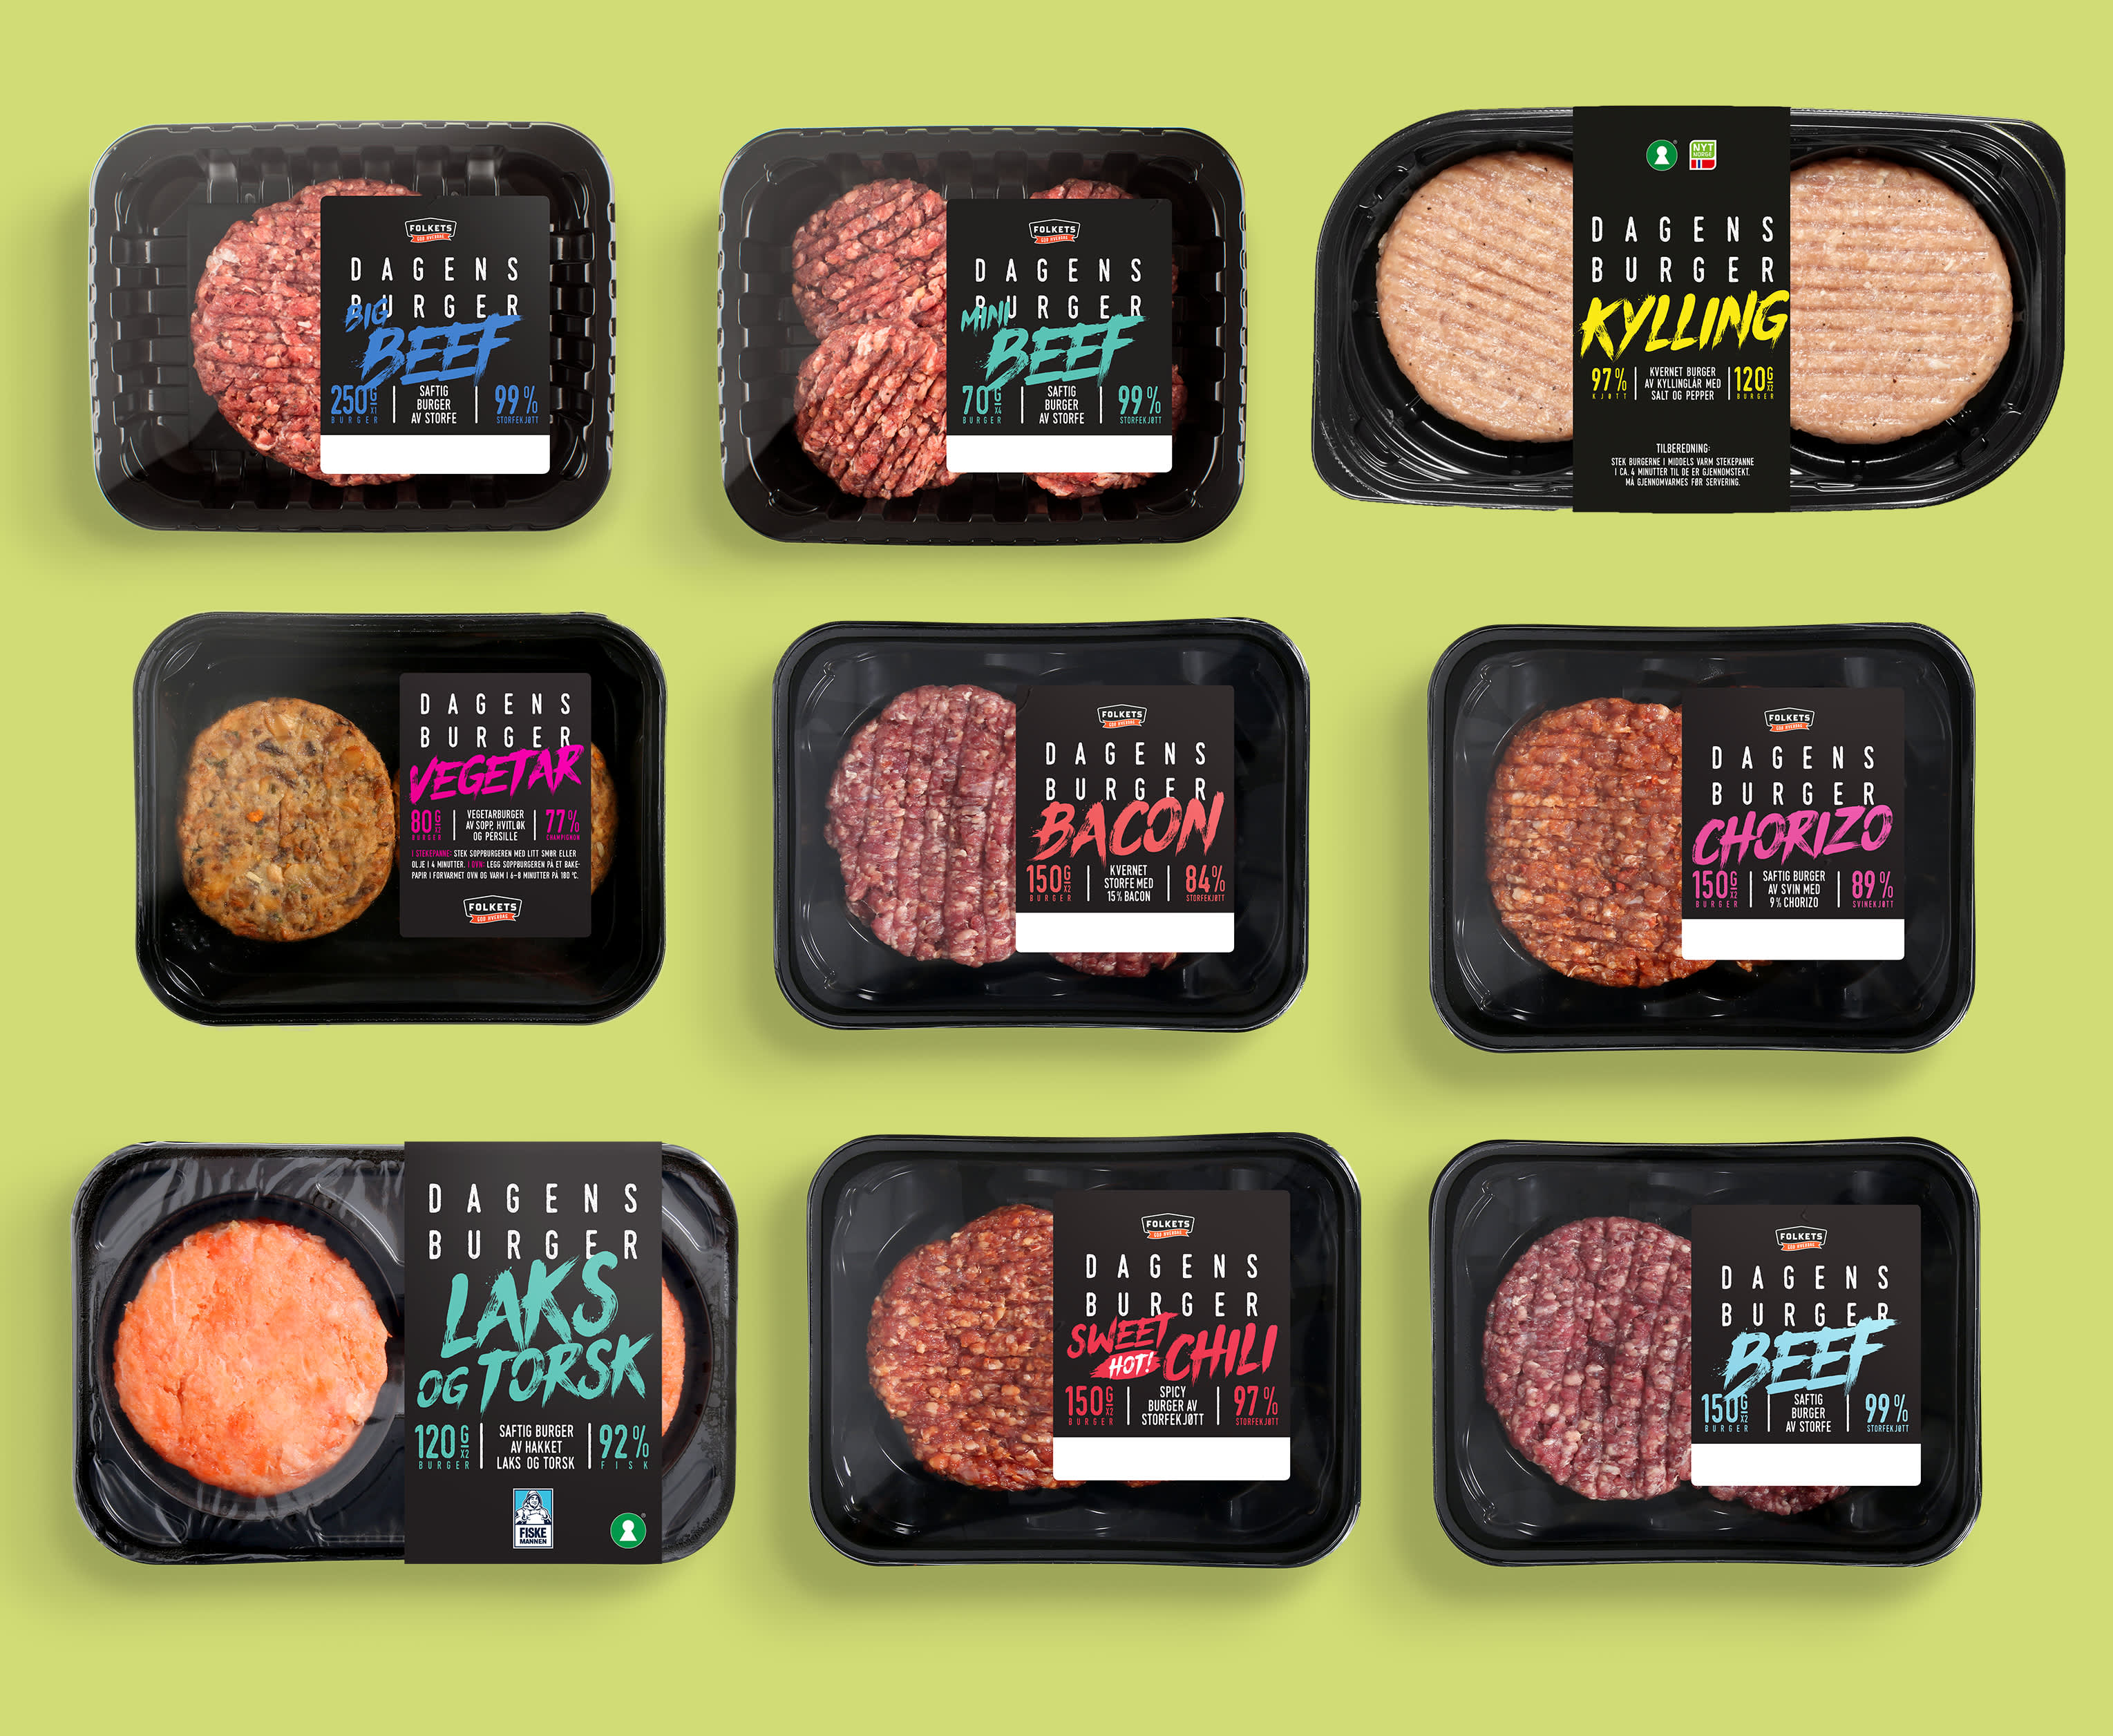 Burgere for alle: Nyhetene Big Beef 39,- og Mini beef 49,90, Kylling 29,-, Vegetar, Bacon 49,-, Chorizo 39,-, Laks og torsk 39,-, Sweet hot chili  49,-, Beef 49,-